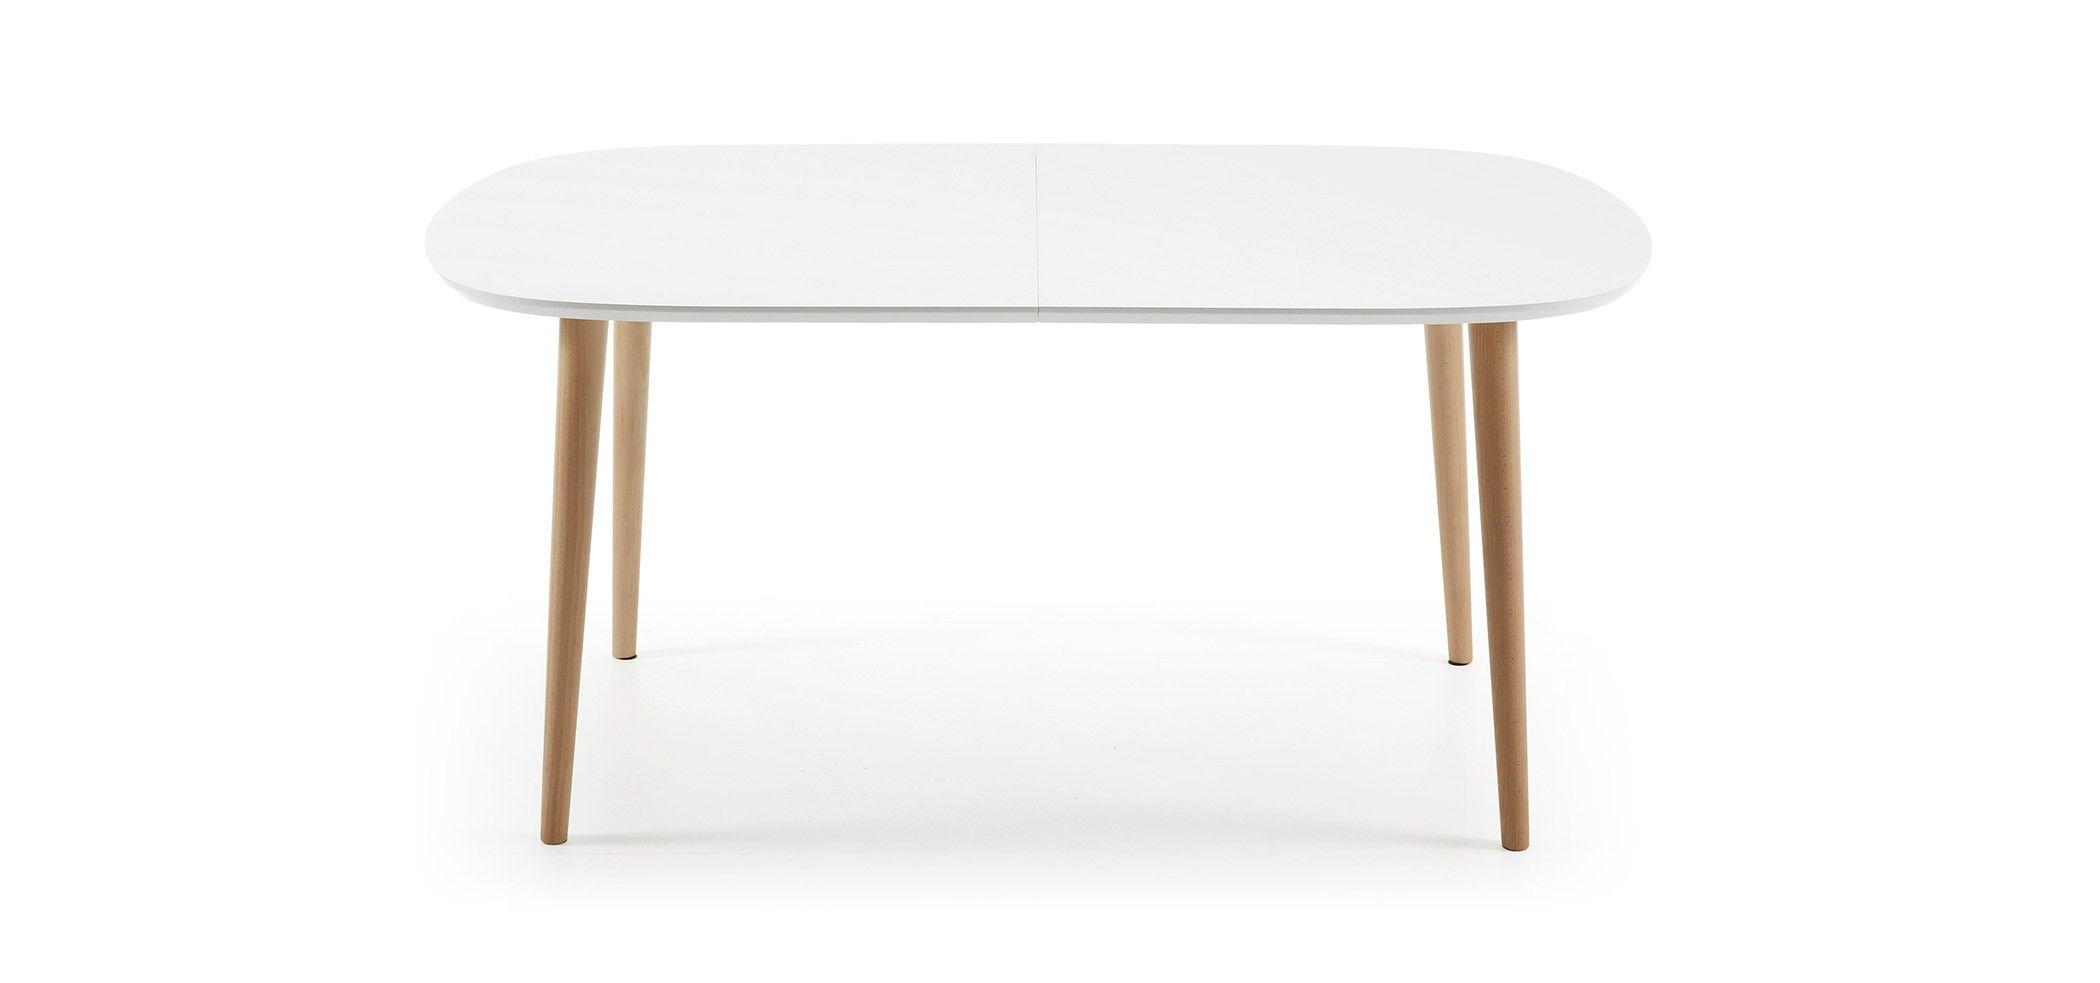 0d44ef395707671db916a60e3e838cc7 Unique De Table Salle A Manger Design Schème